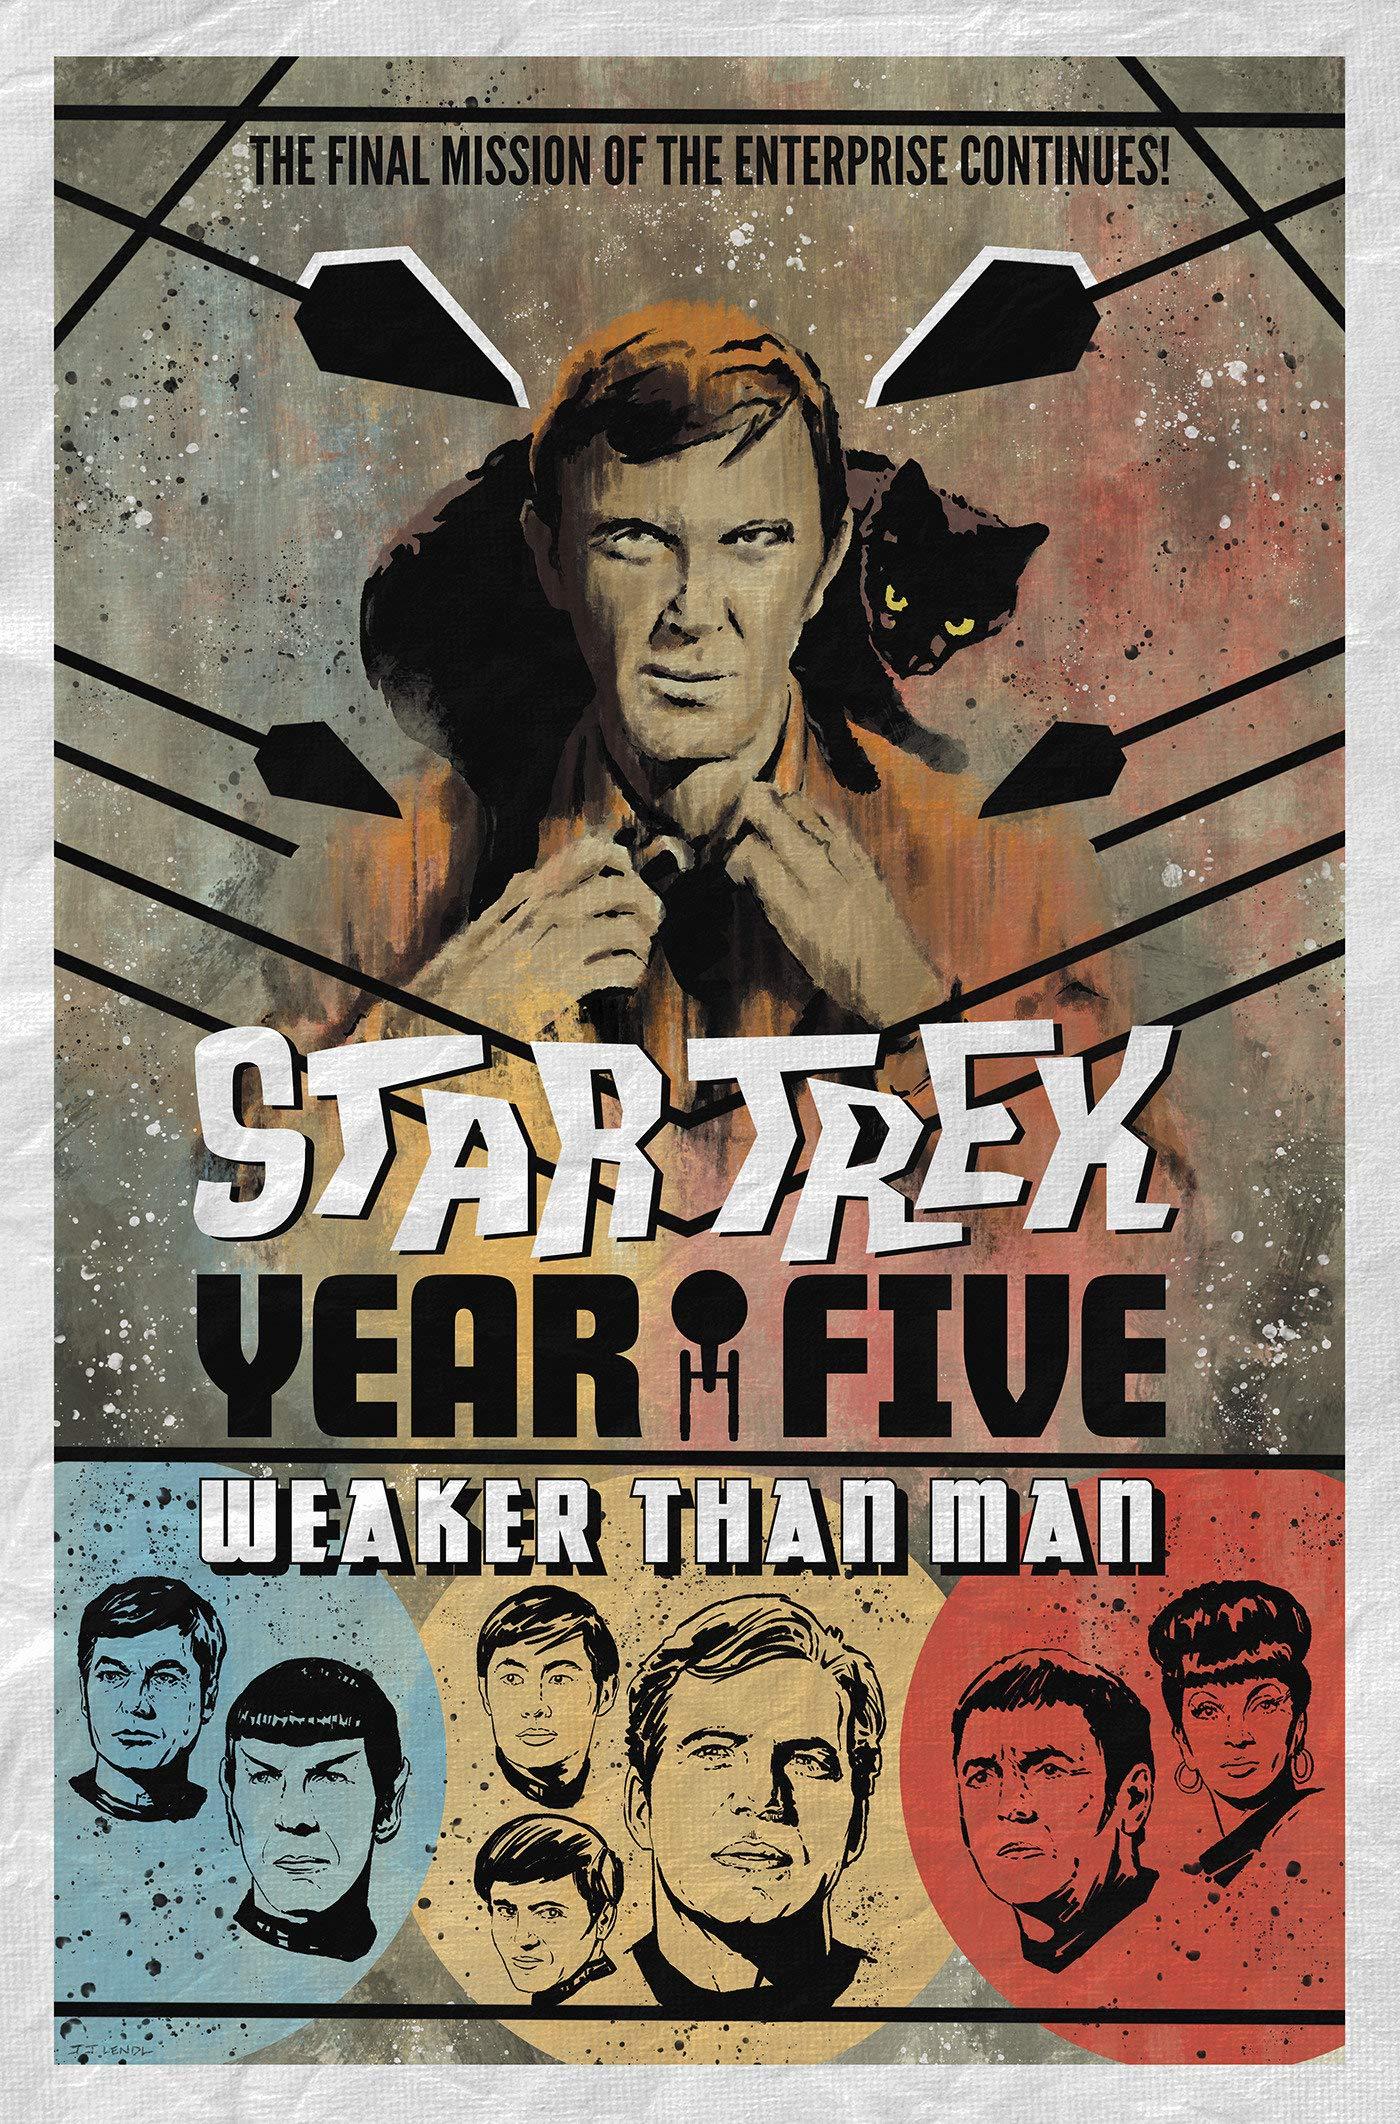 Star Trek: Year Five - Weaker Than Man